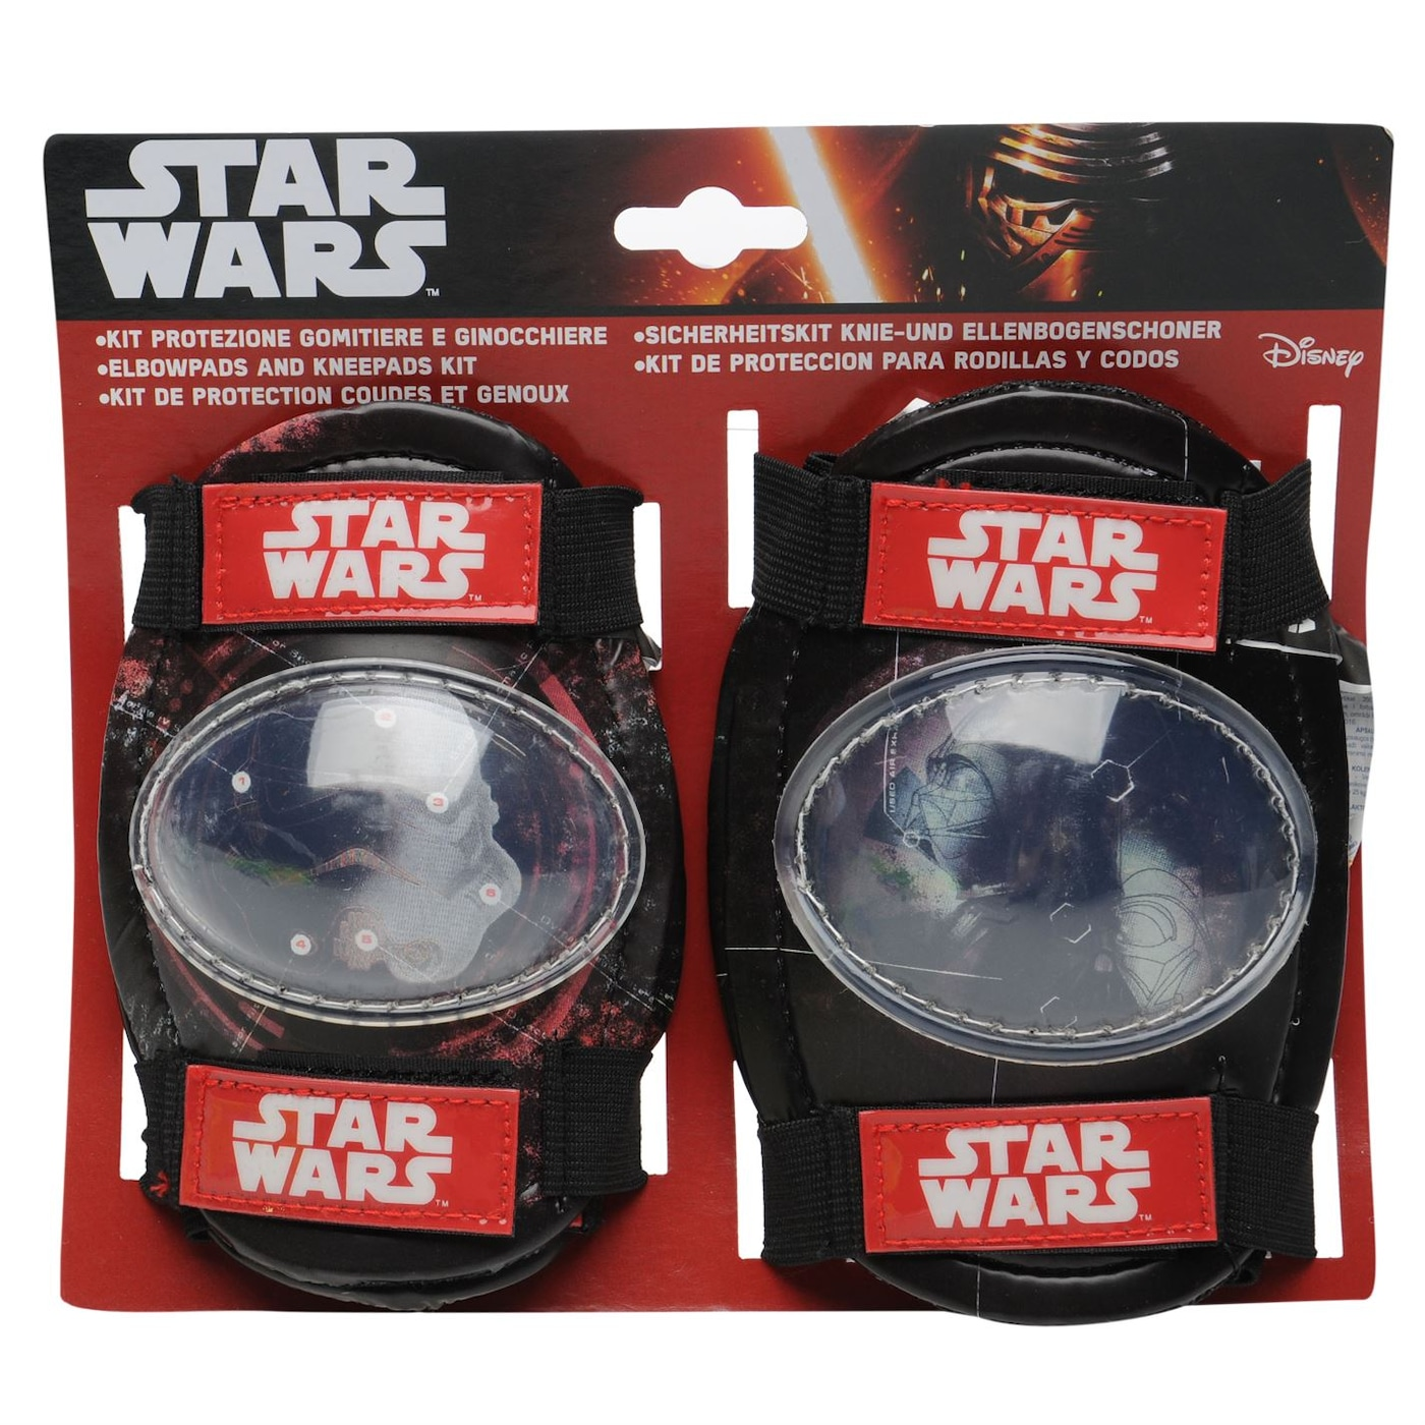 Disney Star Wars Elbow and Knee Pad Set